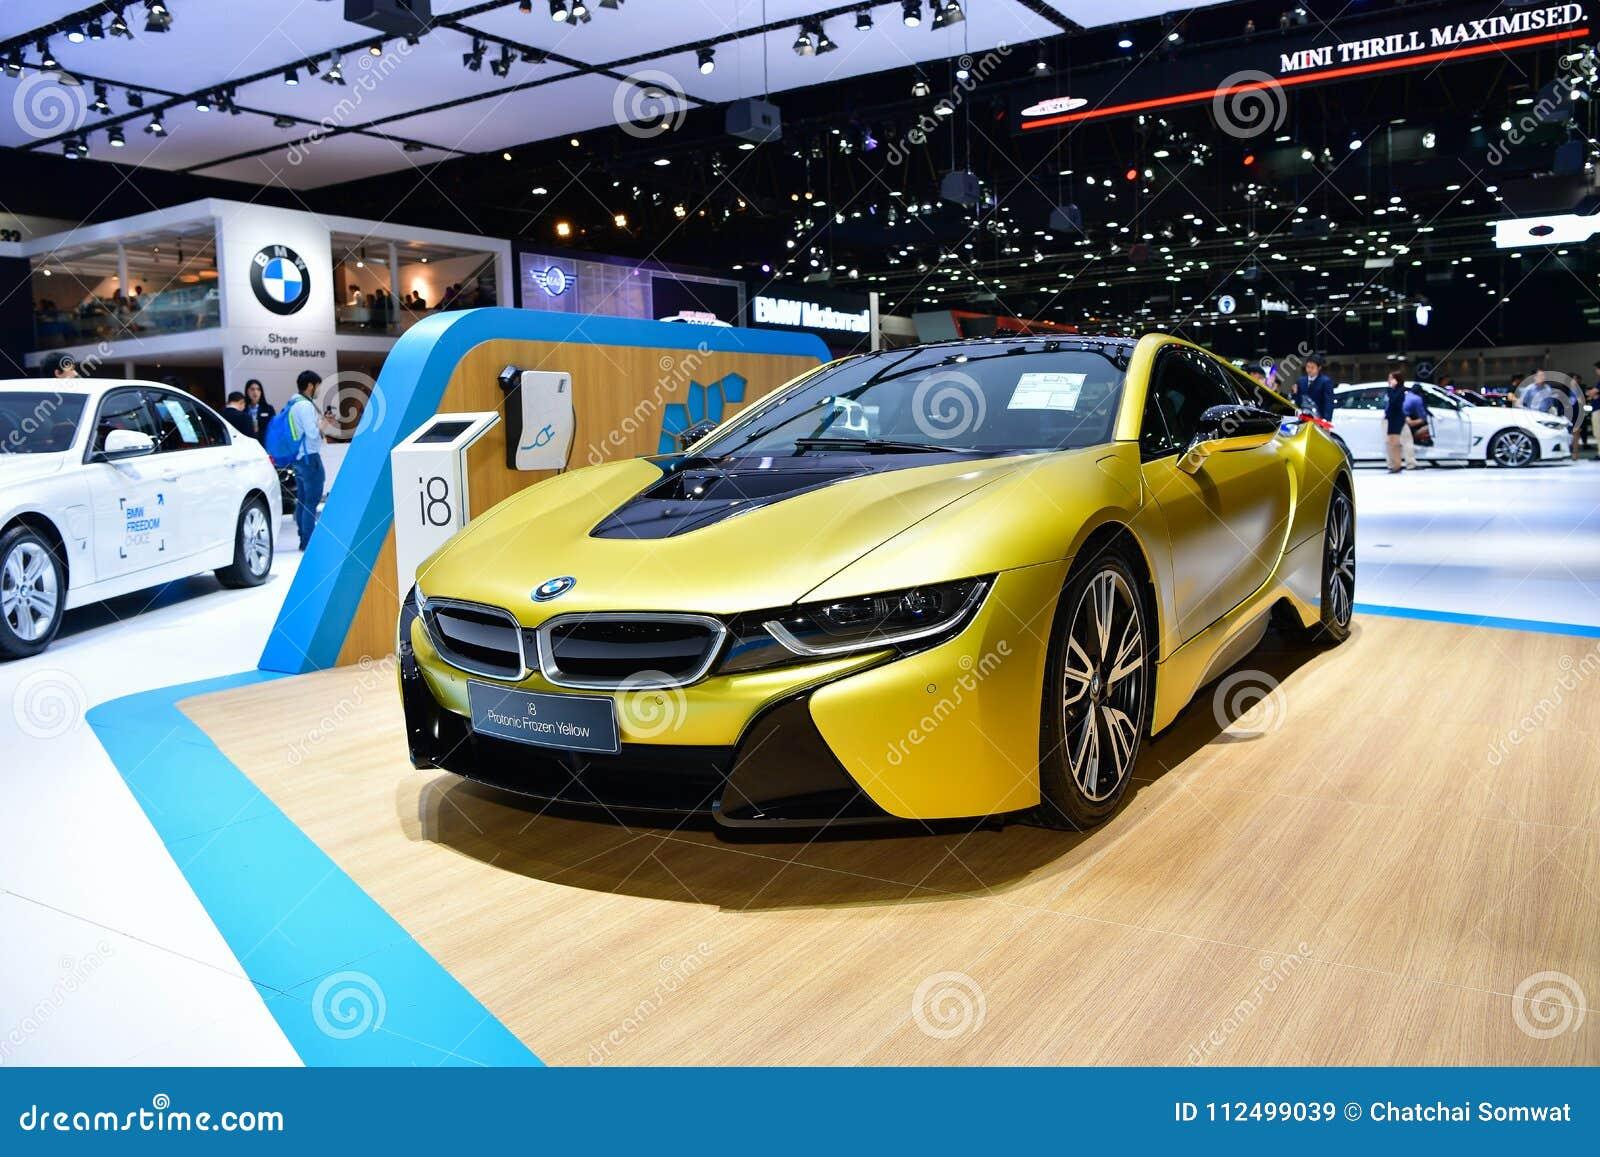 Bmw I8 Protonic Frozen Yellow Car At Thailand International Motor